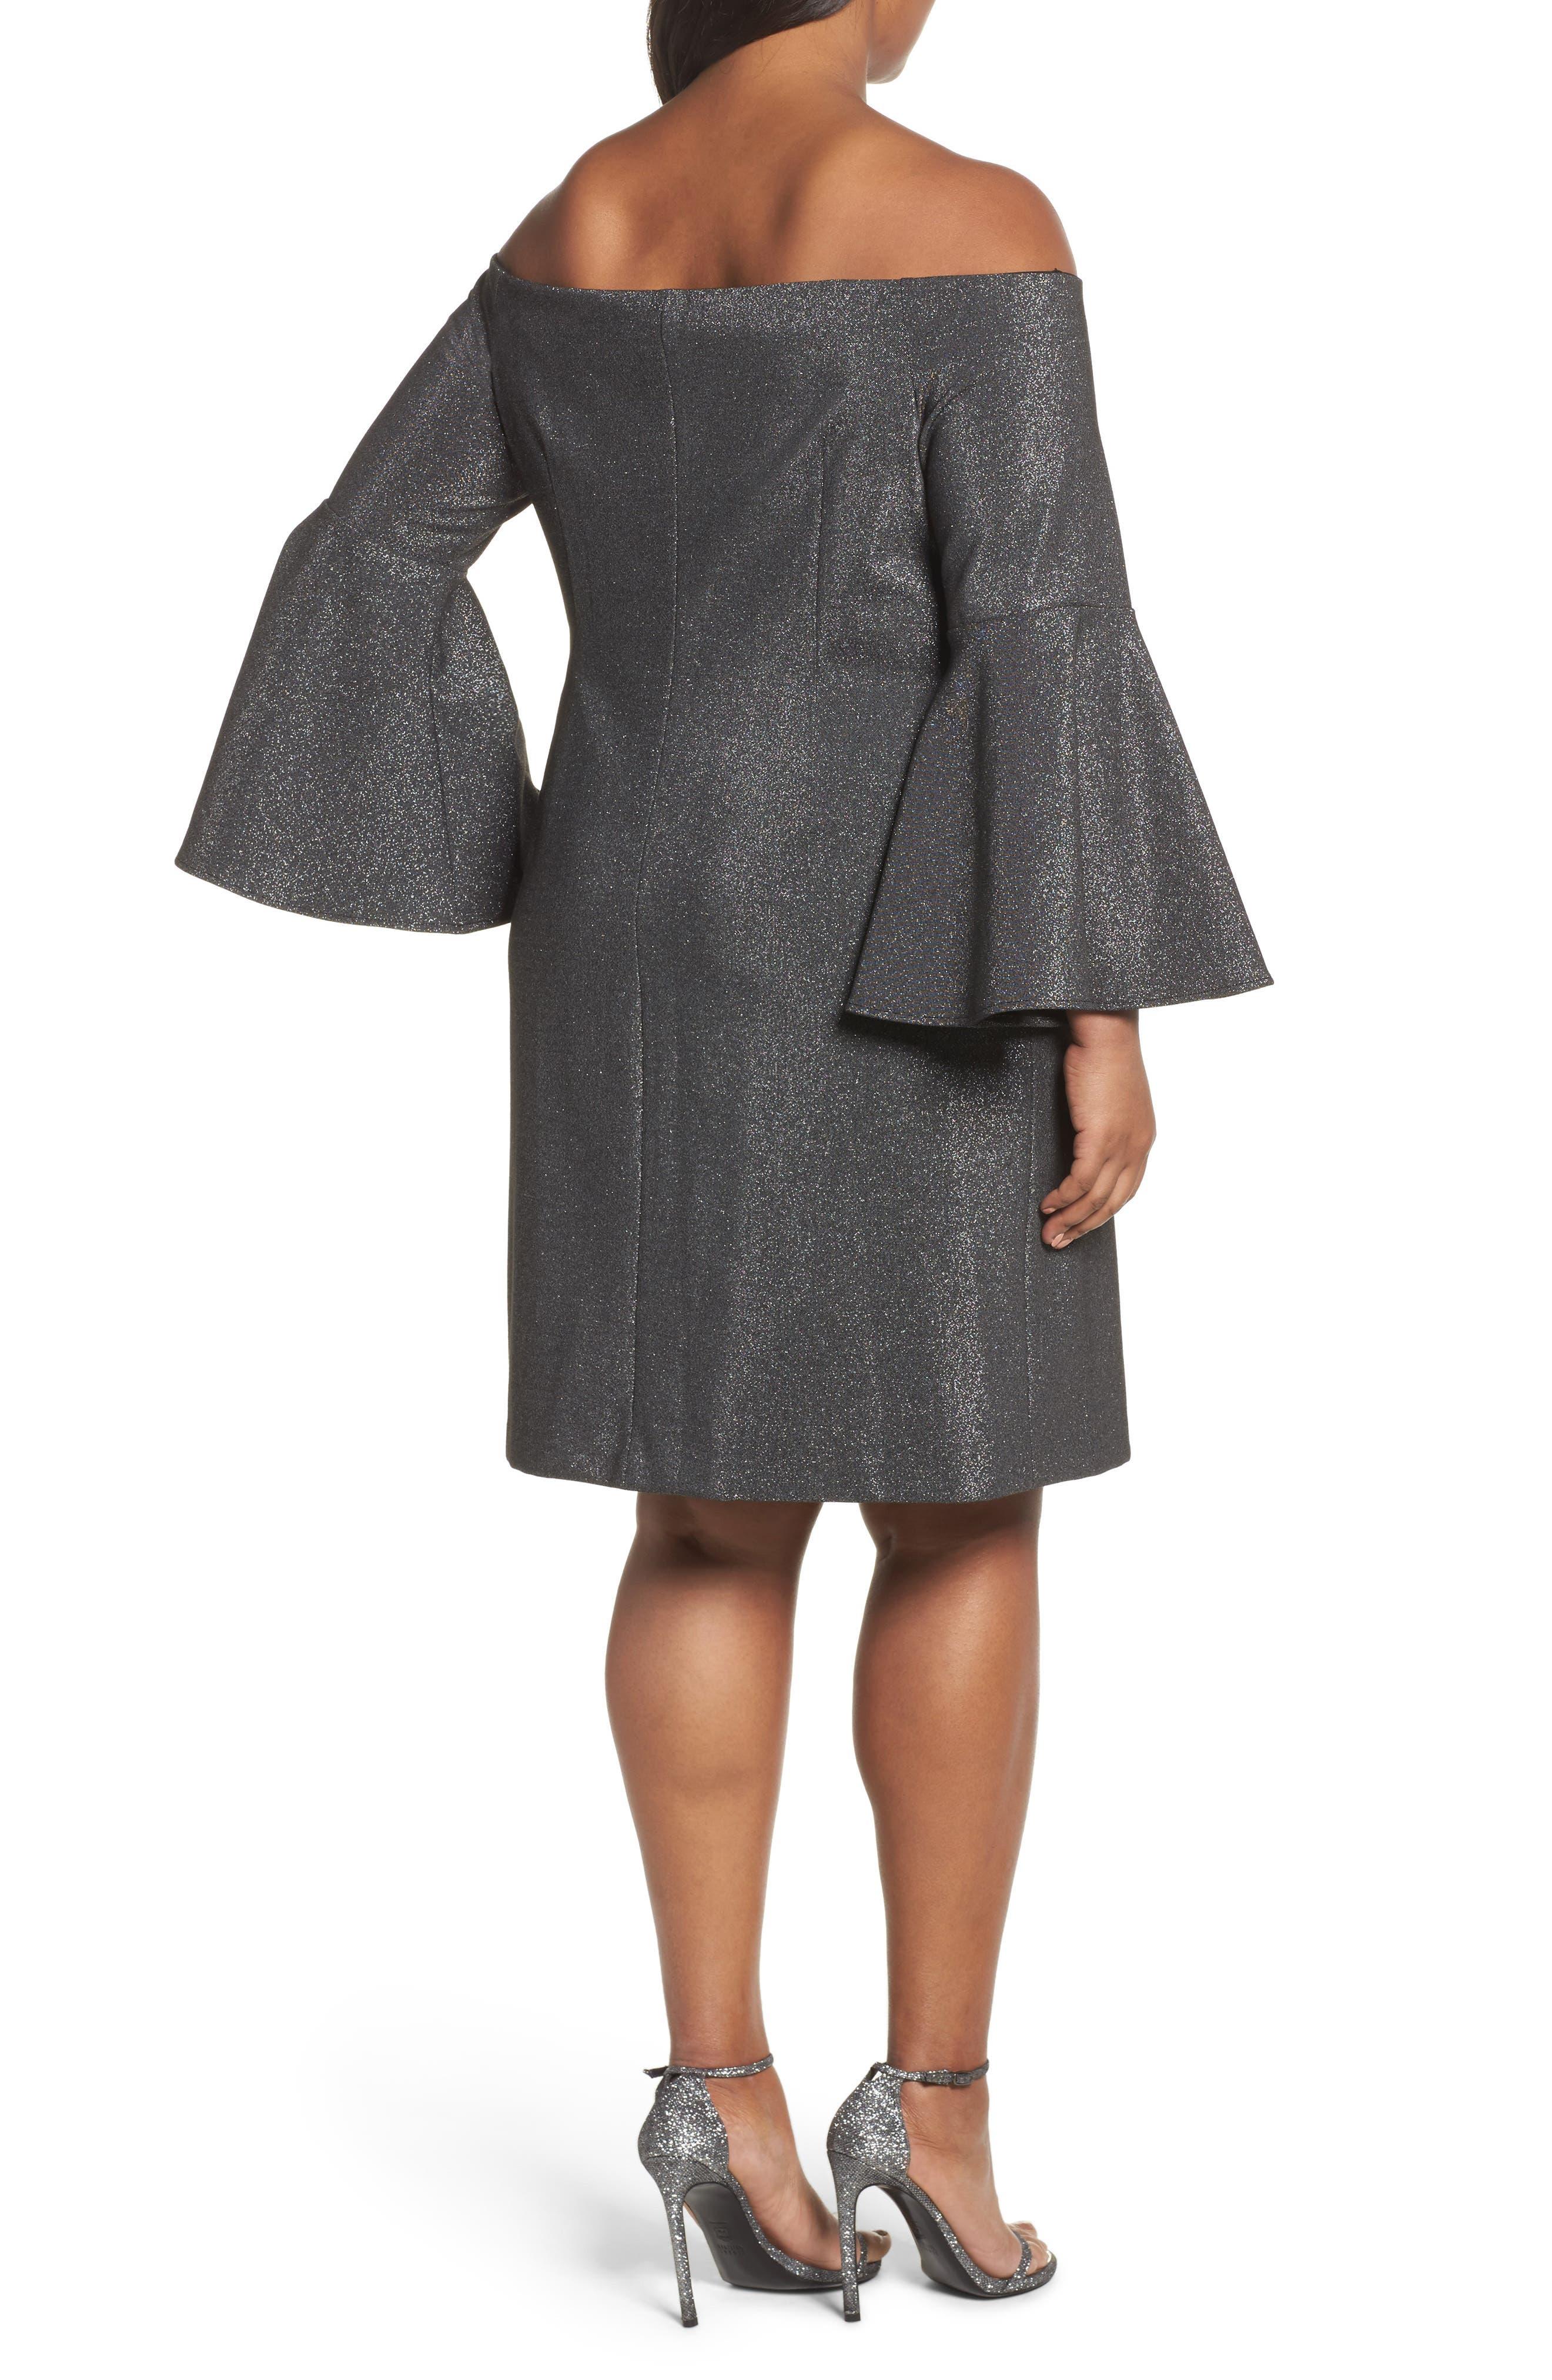 Off the Shoulder Metallic Sheath Dress,                             Alternate thumbnail 2, color,                             006